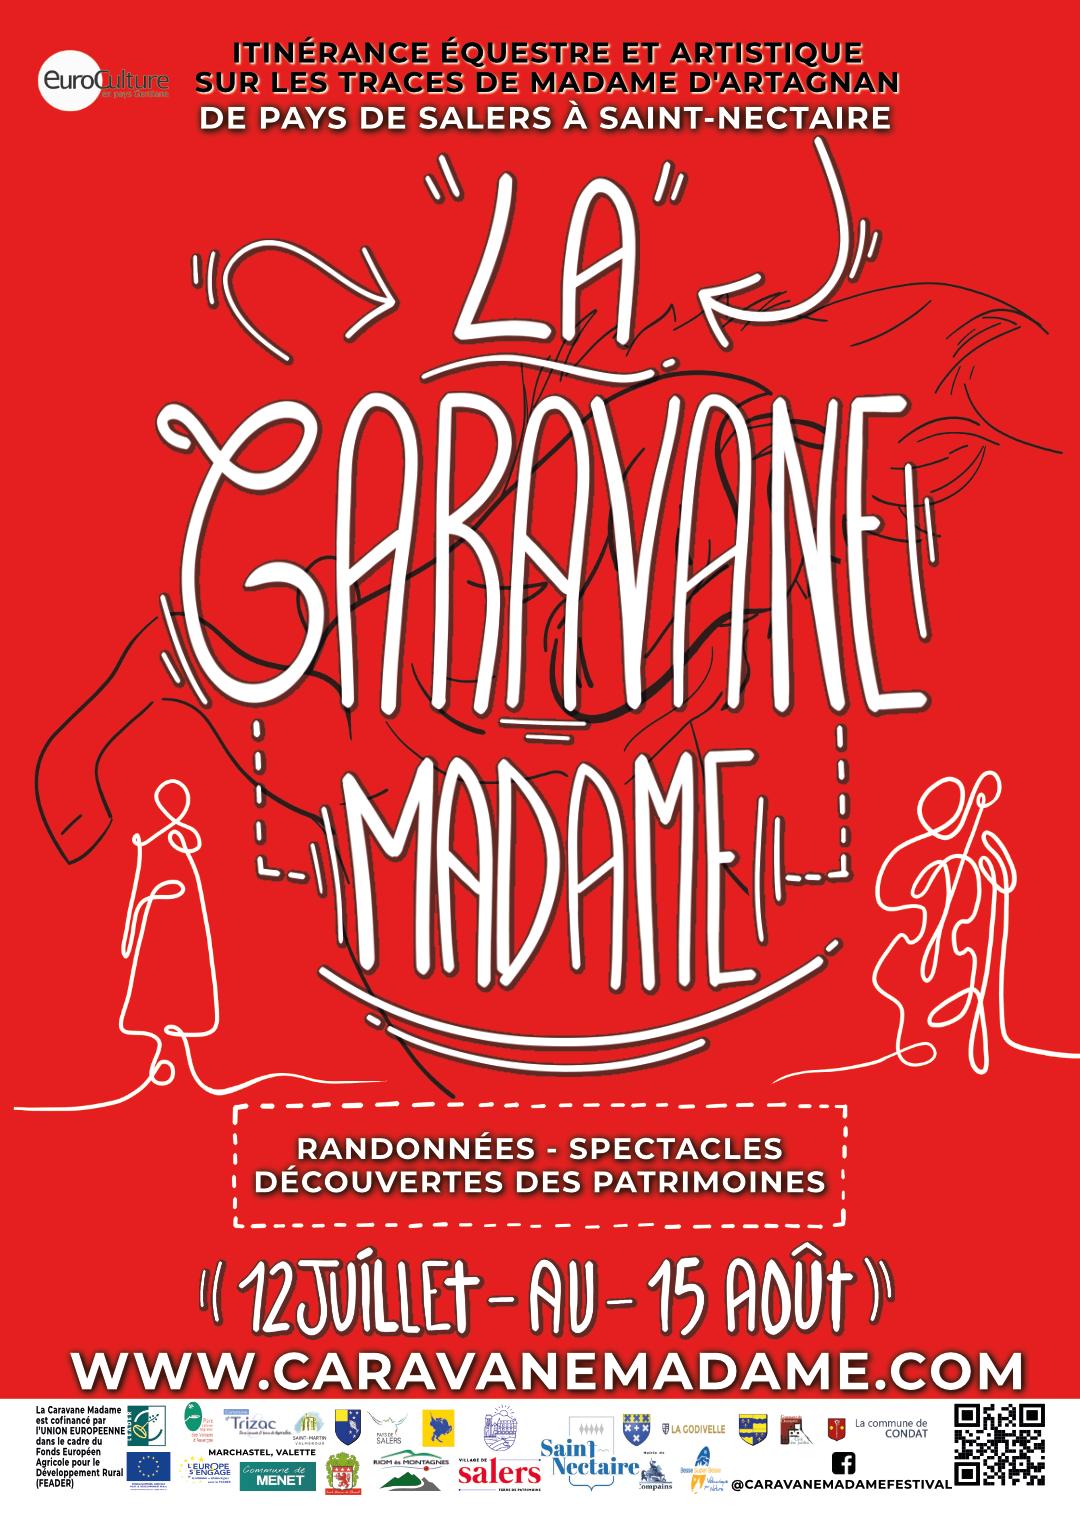 Affiche Caravane Madame